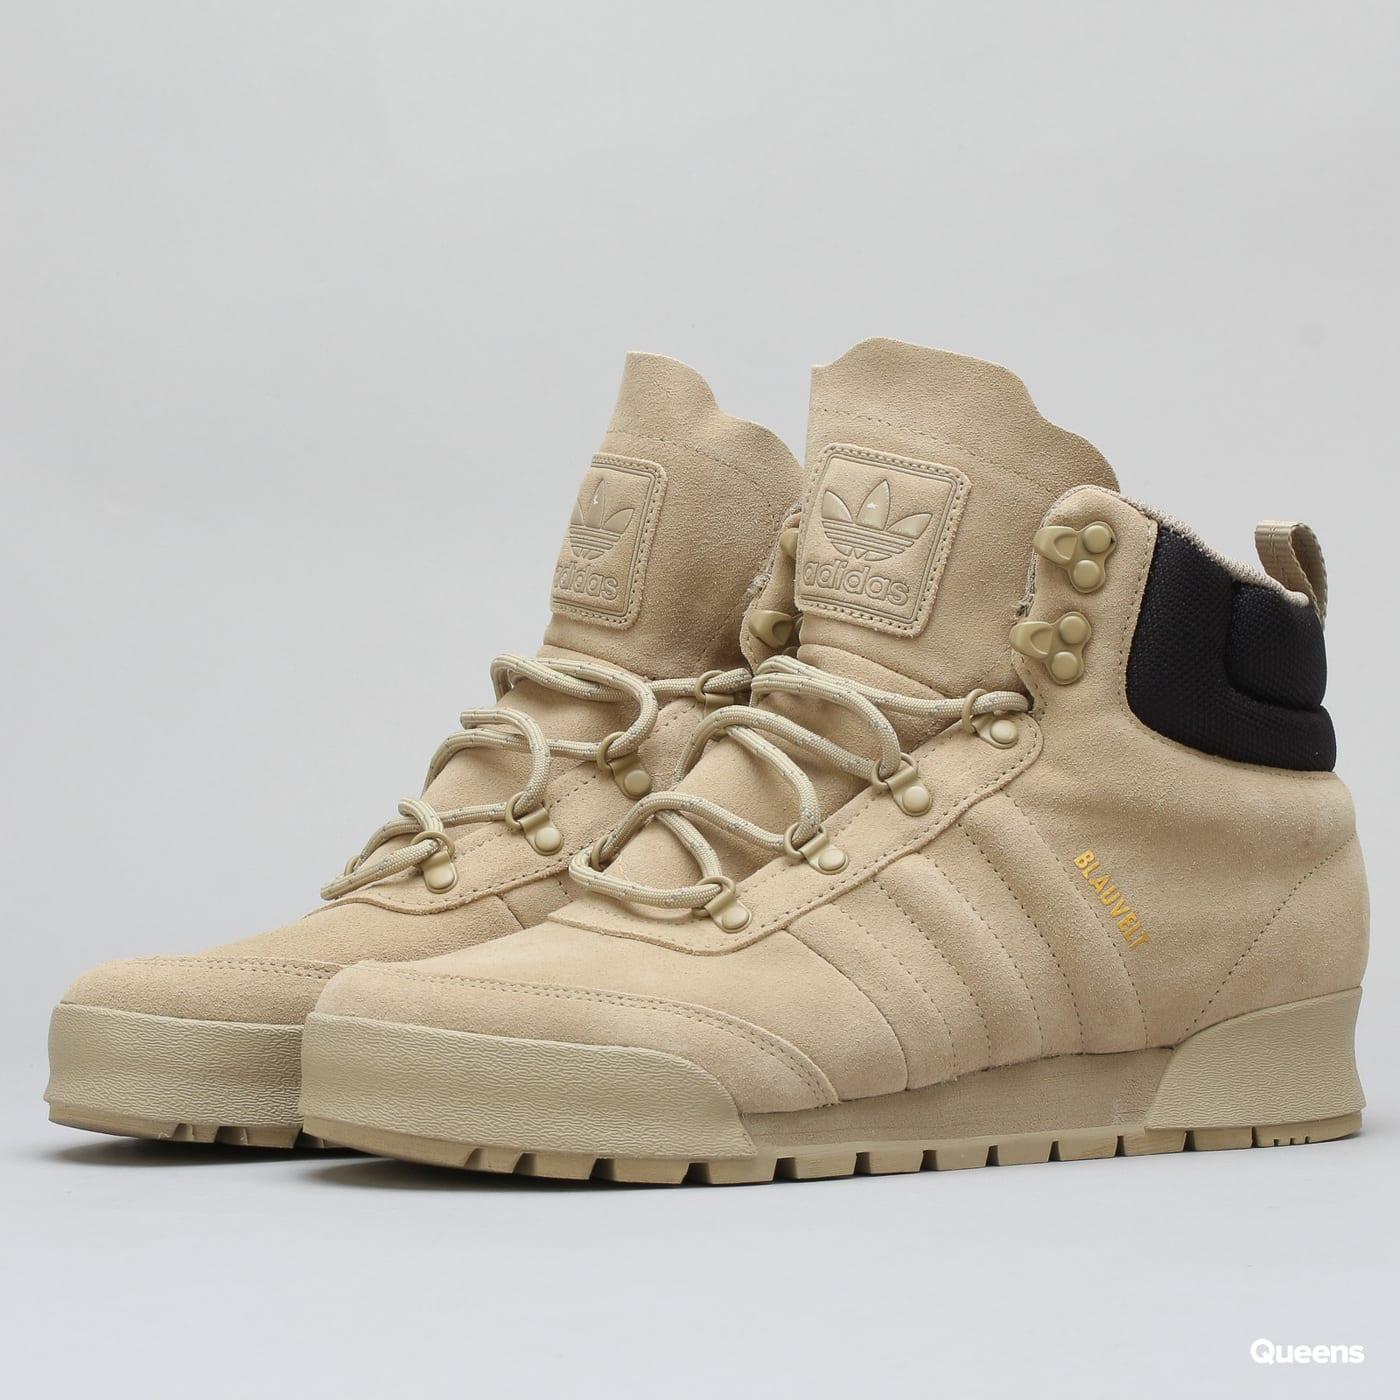 Sneakers adidas Jake Boot 2.0 rawgol